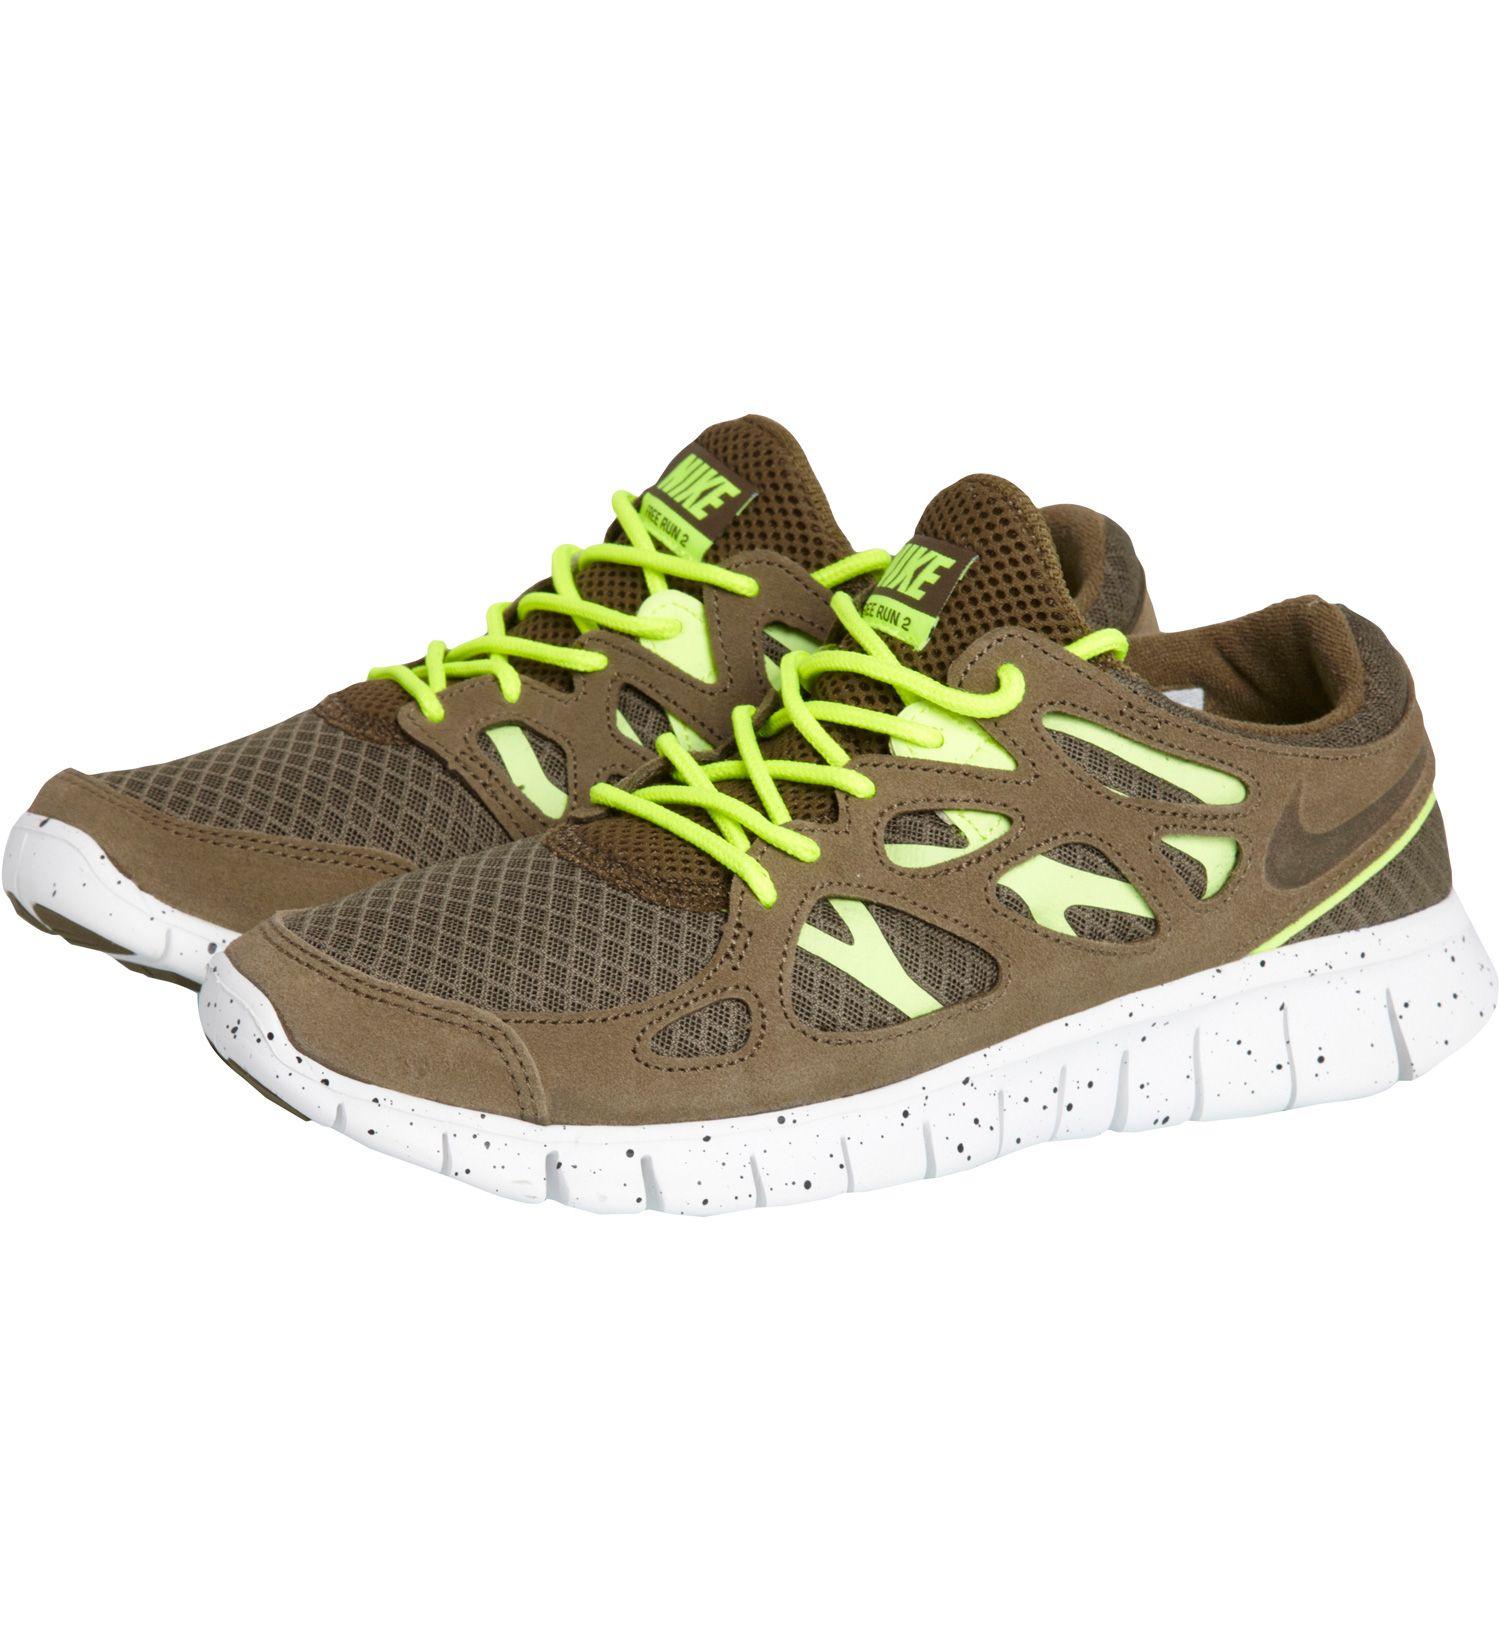 nouveau style 5fbcc 2ec68 Nike Free Run +2 Ext / Vert | E-shop Citadium | trainer fetish